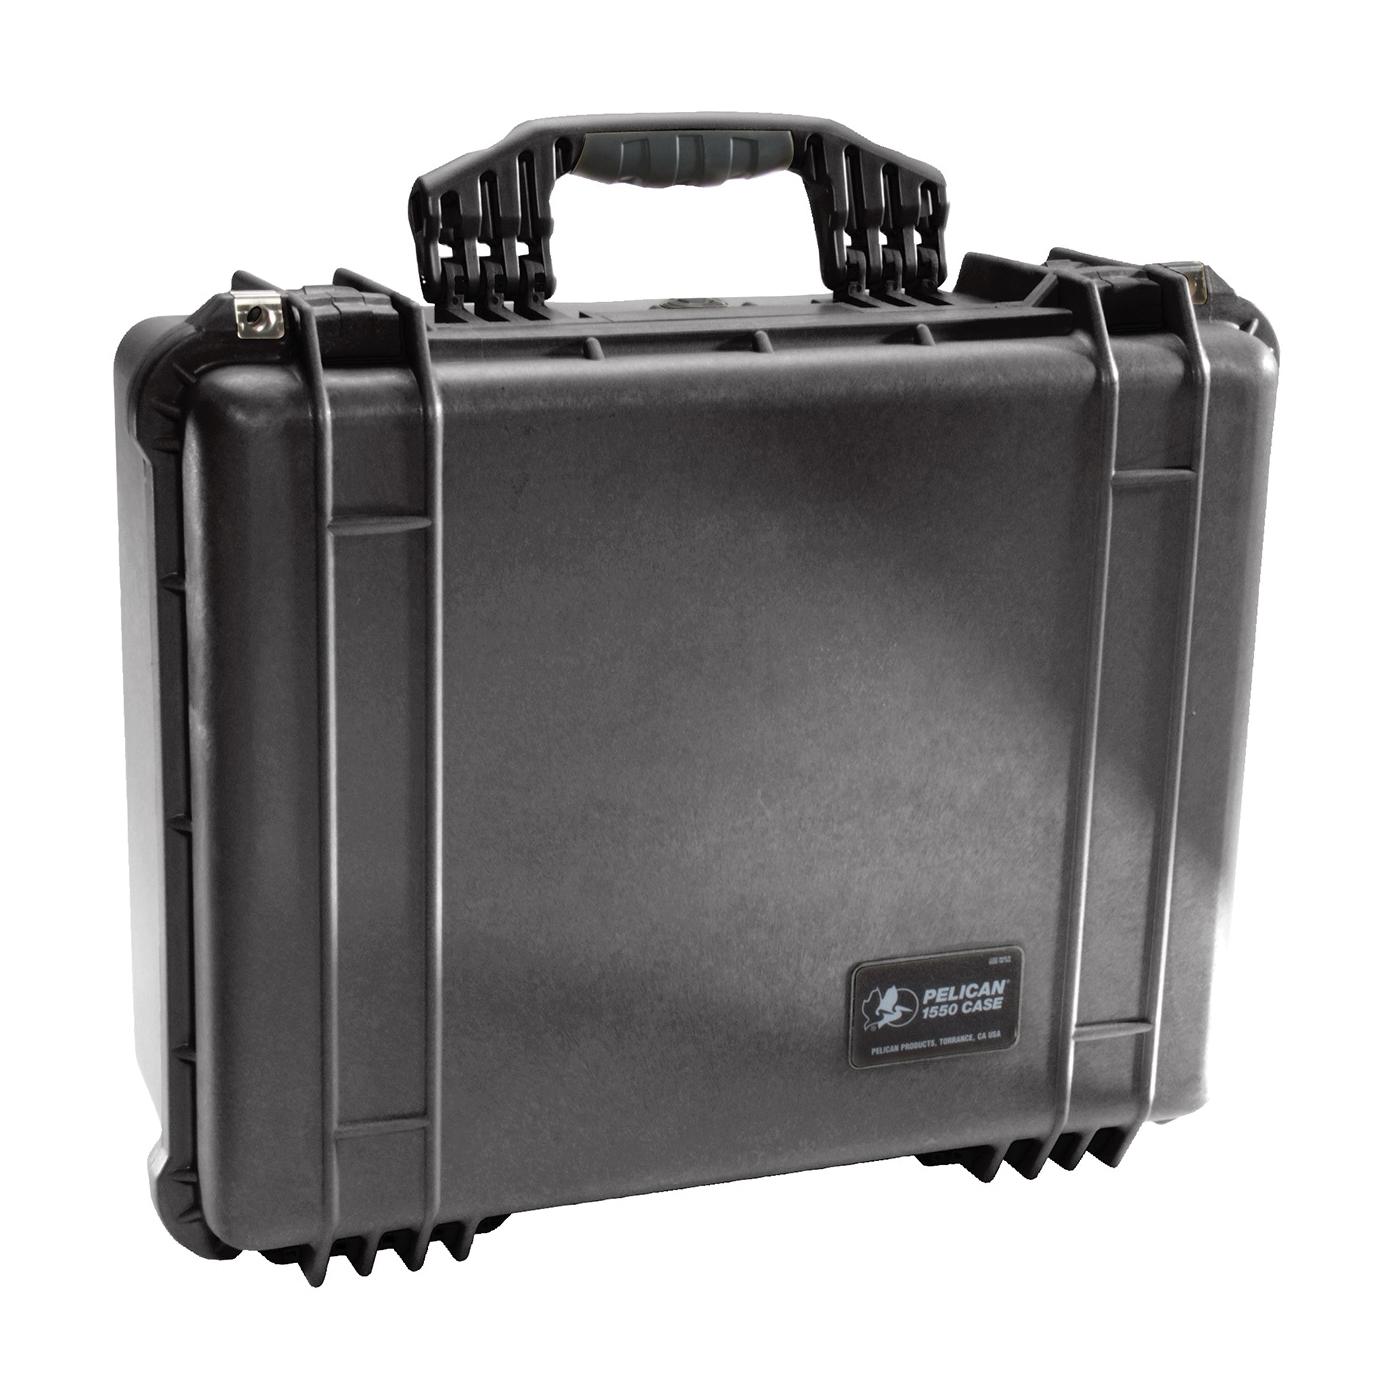 Pelican™ PROTECTOR CASE™ 1550-000-110 Medium Protective Case With Foam and Lid Liner, 18.43 in L x 14 in W x 7.62 in H, 1.18 cu-ft, Polypropylene